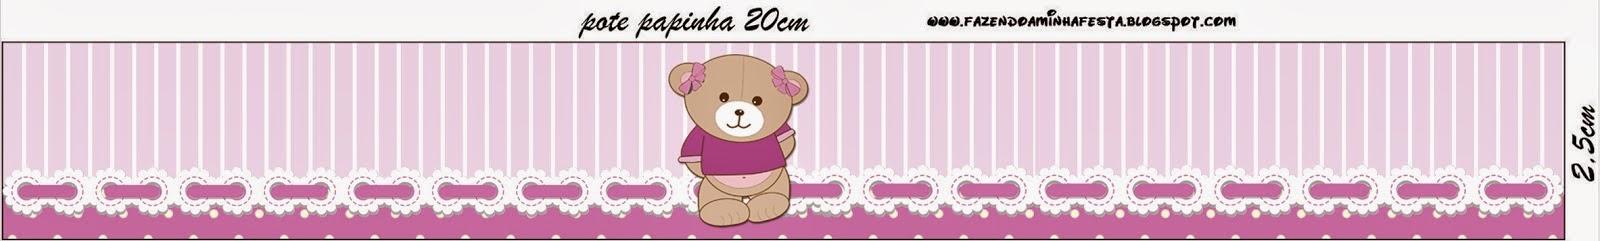 Etiquetas de Osita en Fondo Lila para imprimir gratis.